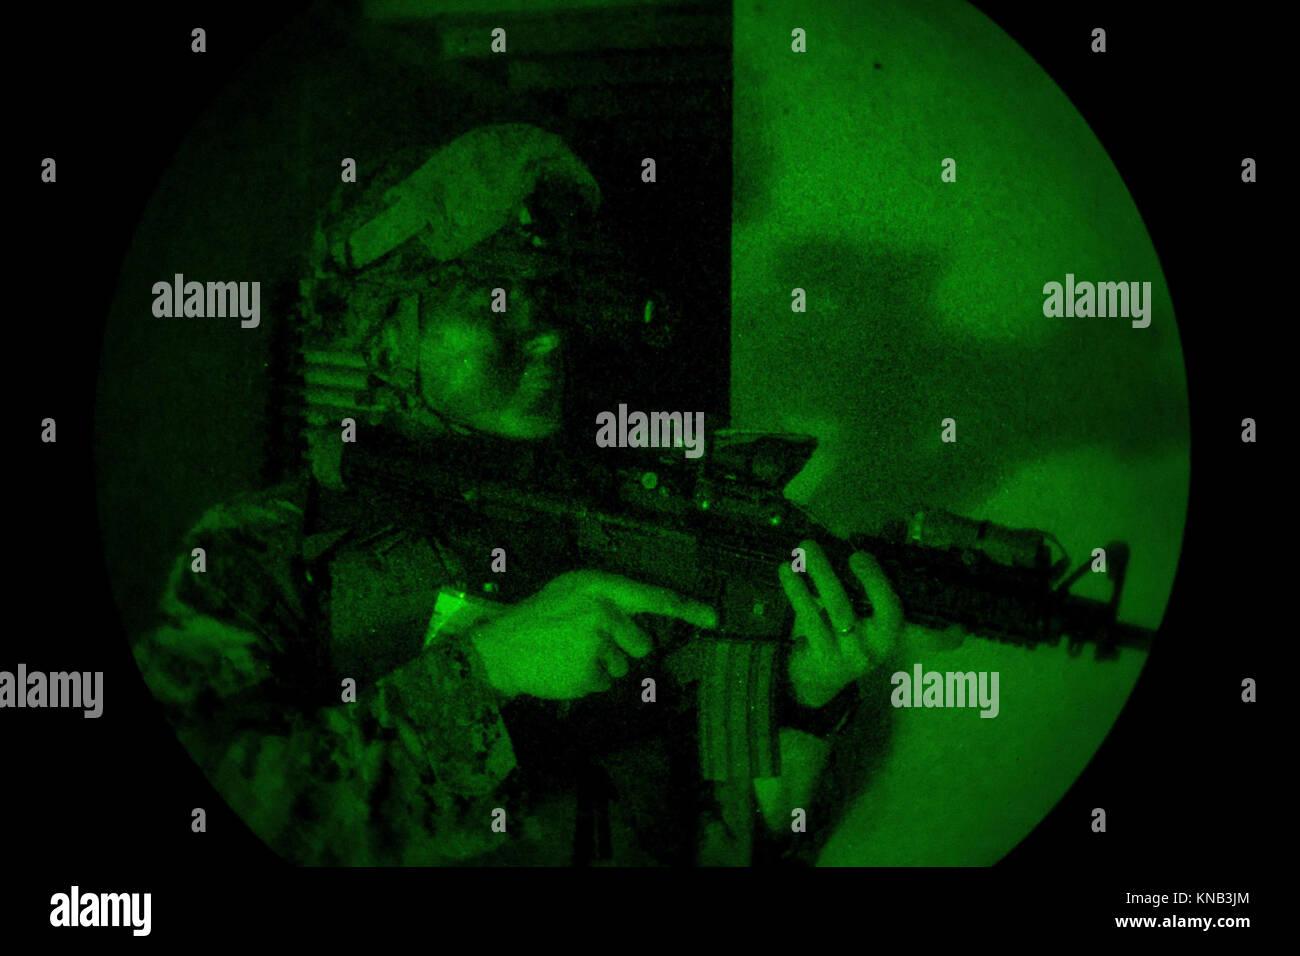 A U.S. Marine with Battalion Landing Team, 2nd Battalion, 6th Marine Regiment, 26th Marine Expeditionary Unit (MEU), Stock Photo